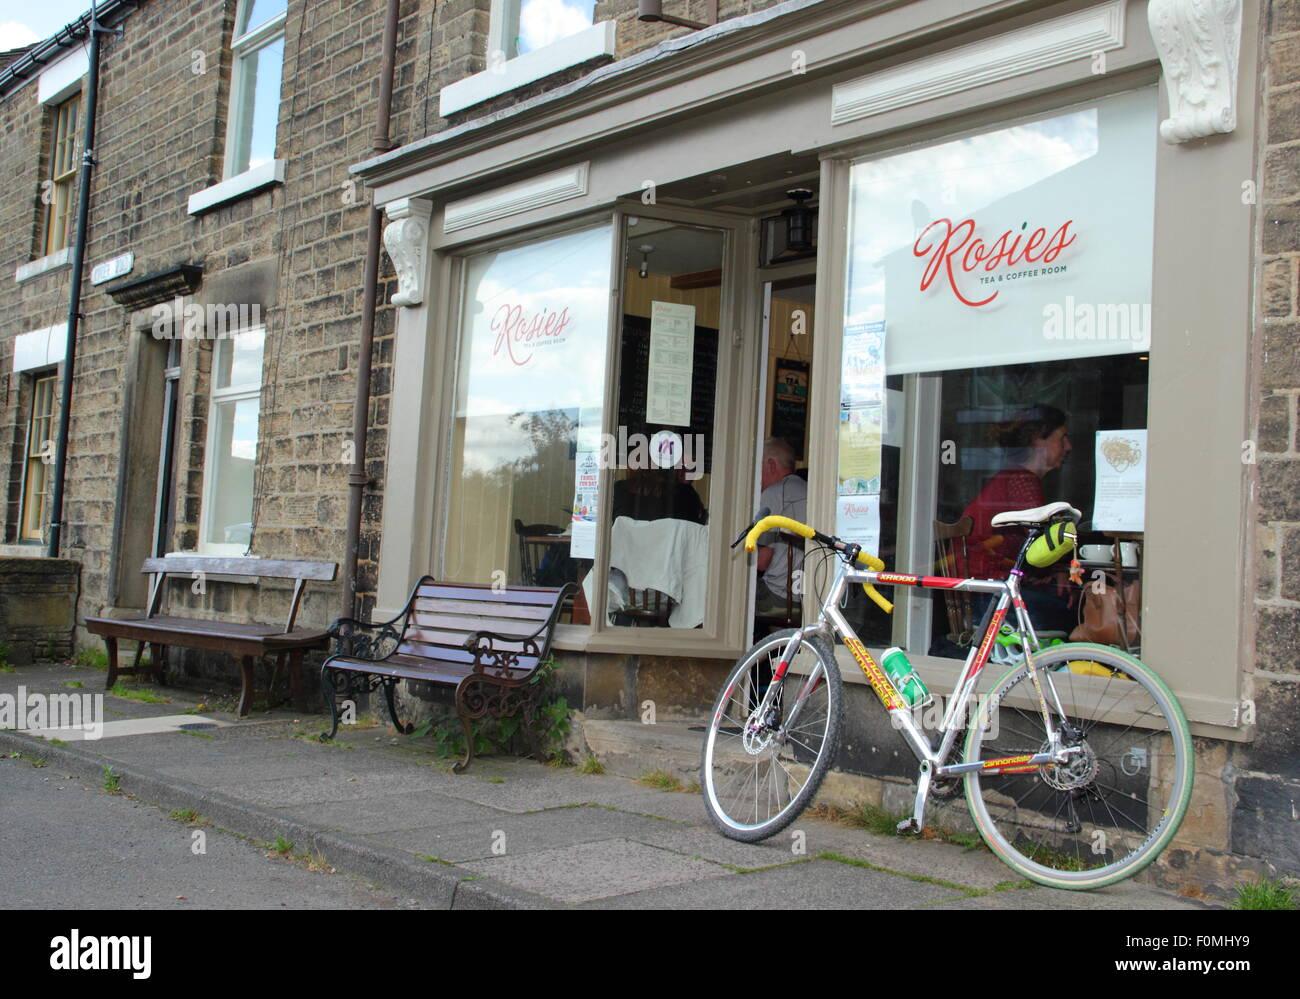 Rosie's Tea & Coffee Room in Hayfield, High Peak, Derbyshire, northern England UK - Stock Image